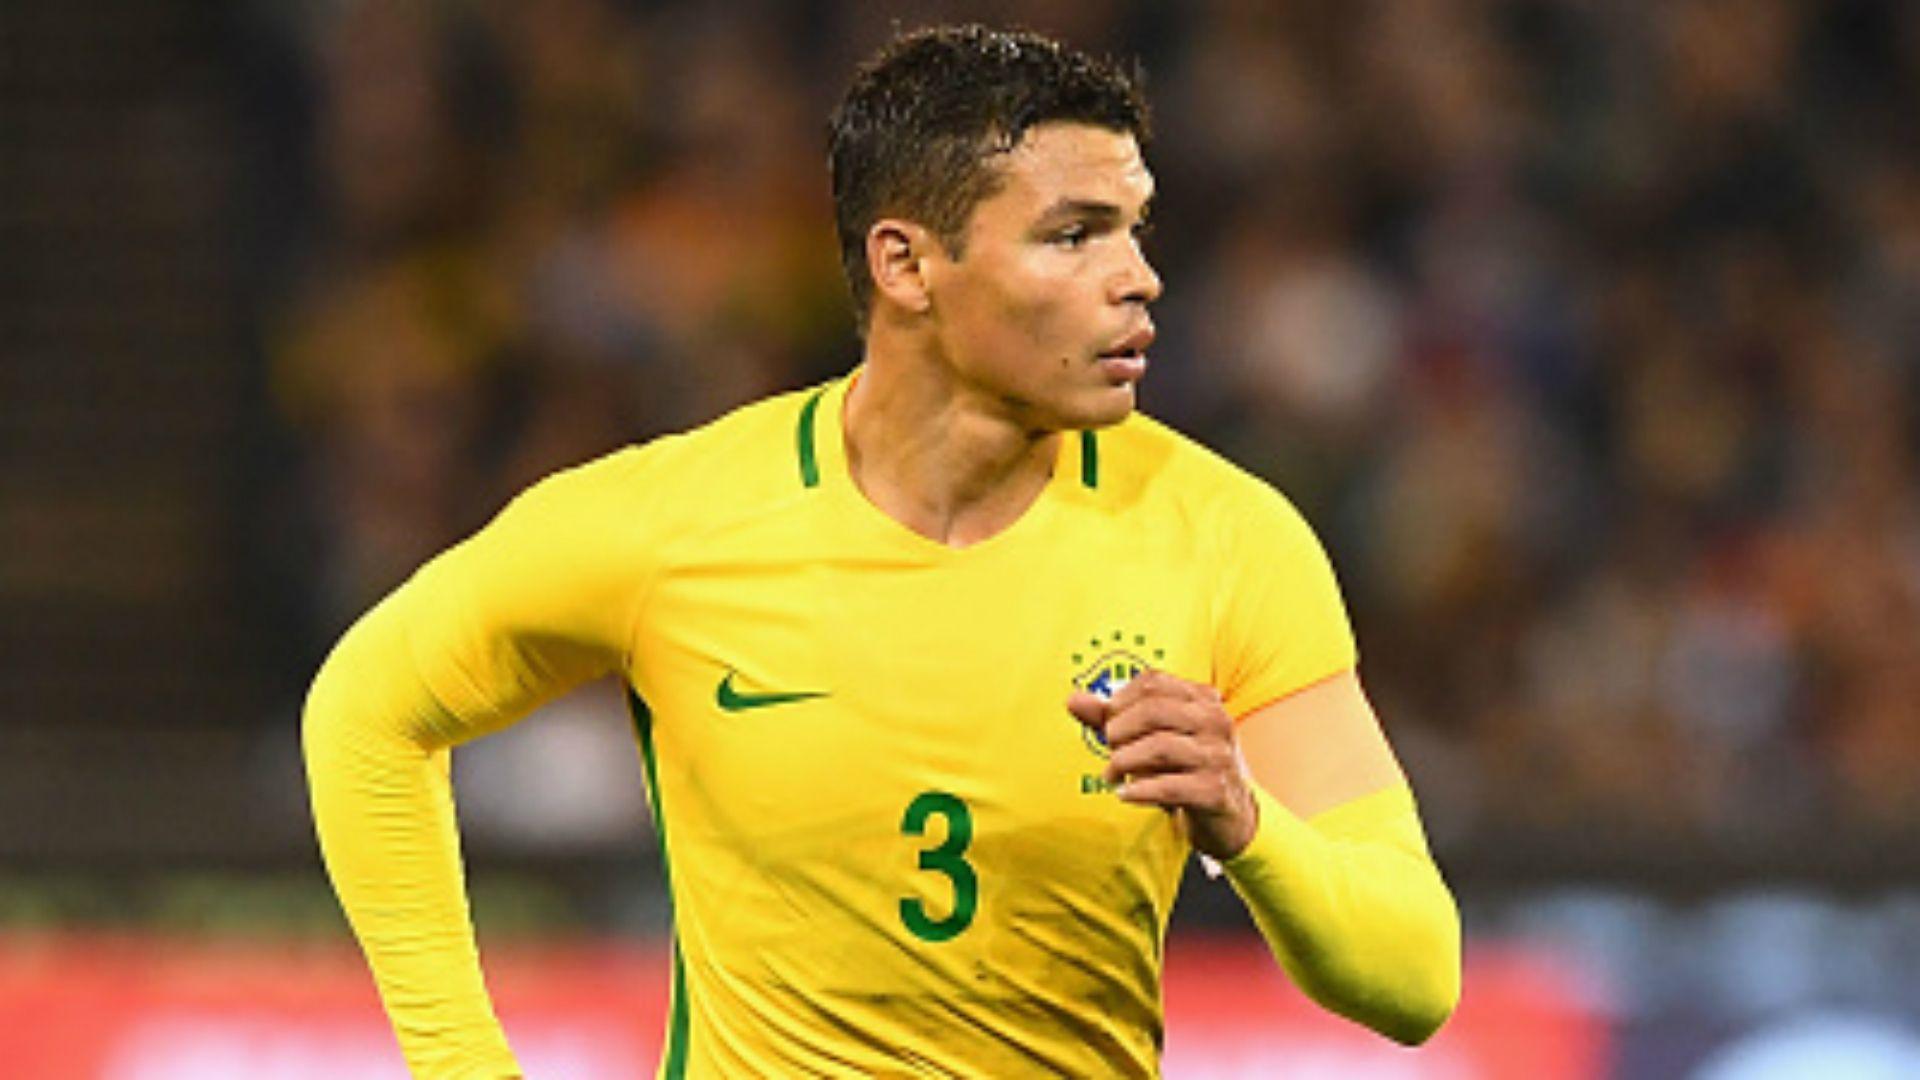 Fifa World Cup Brazil 2018 Thiago Silva , HD Wallpaper & Backgrounds